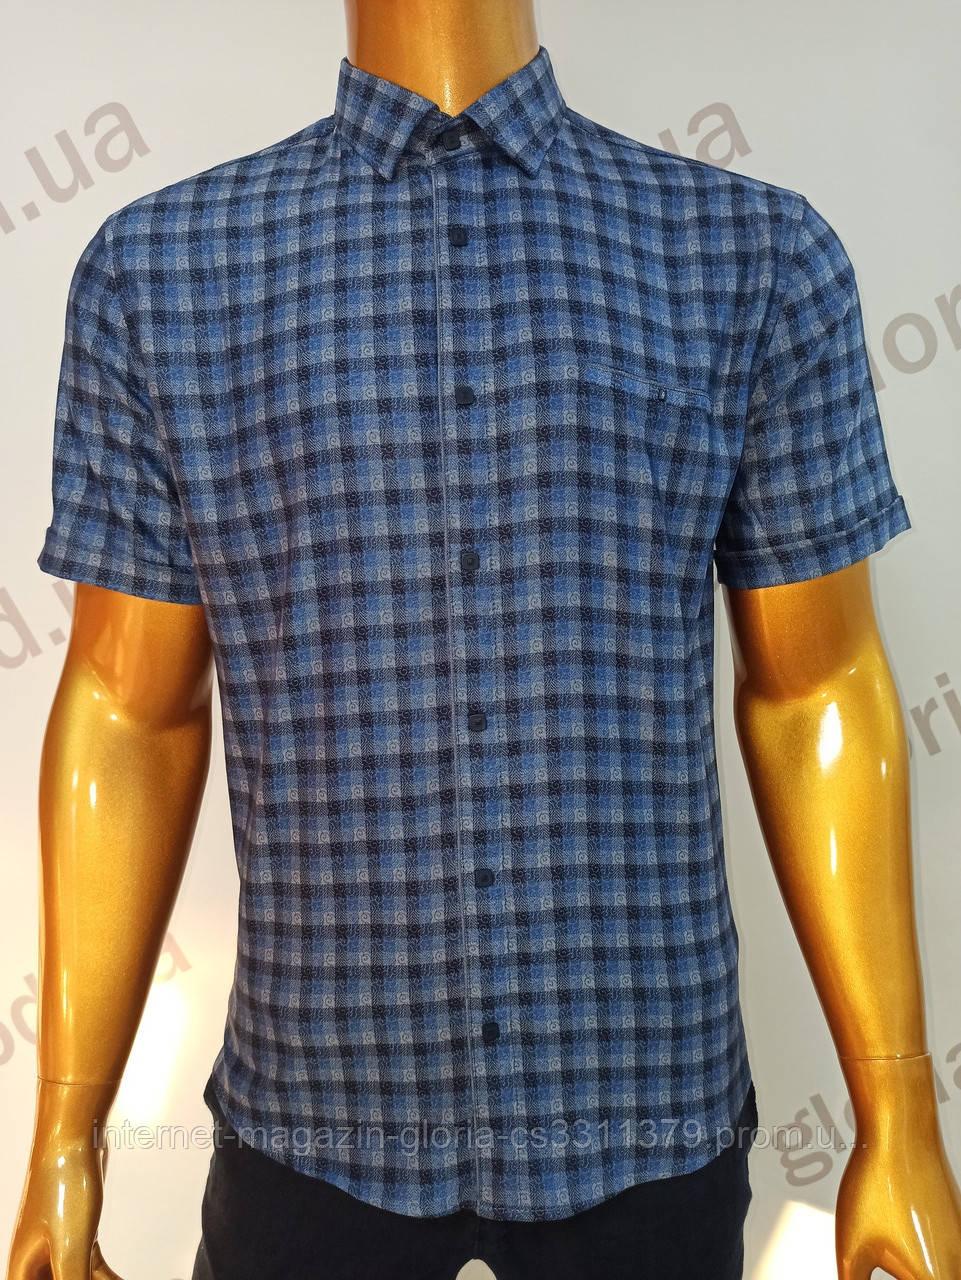 Мужская рубашка Amato. AG.19501(s). Размеры:L,XL(2), XXL.